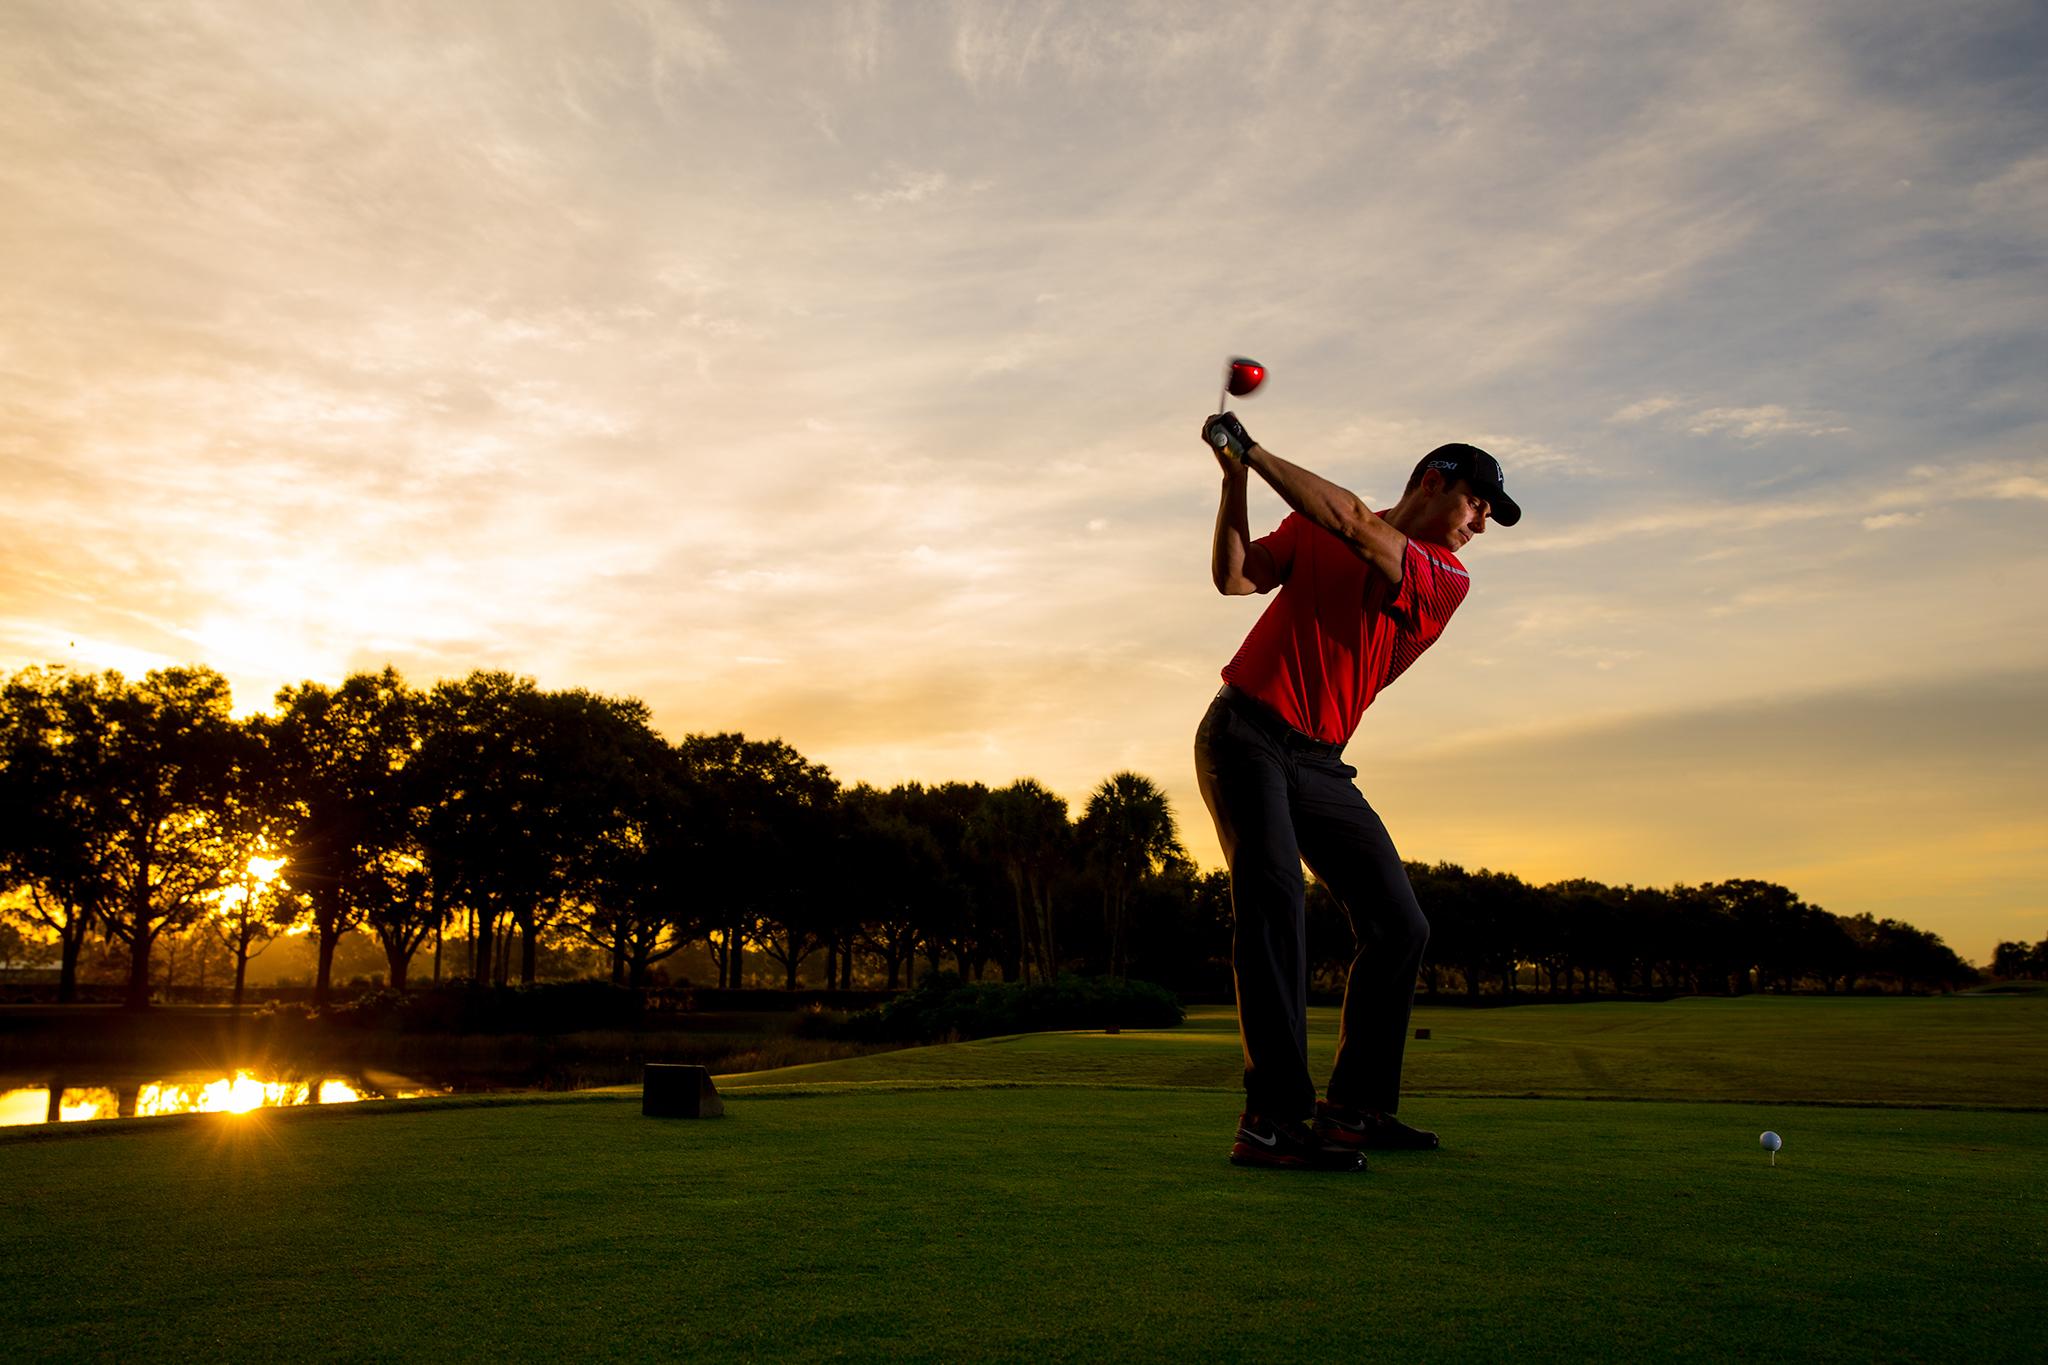 2015 Golf Galaxy catalog shoot,  Grand Cypress Resort, Orlando, Florida. Canon 1DX, Canon EF 24-70mm f2.8L